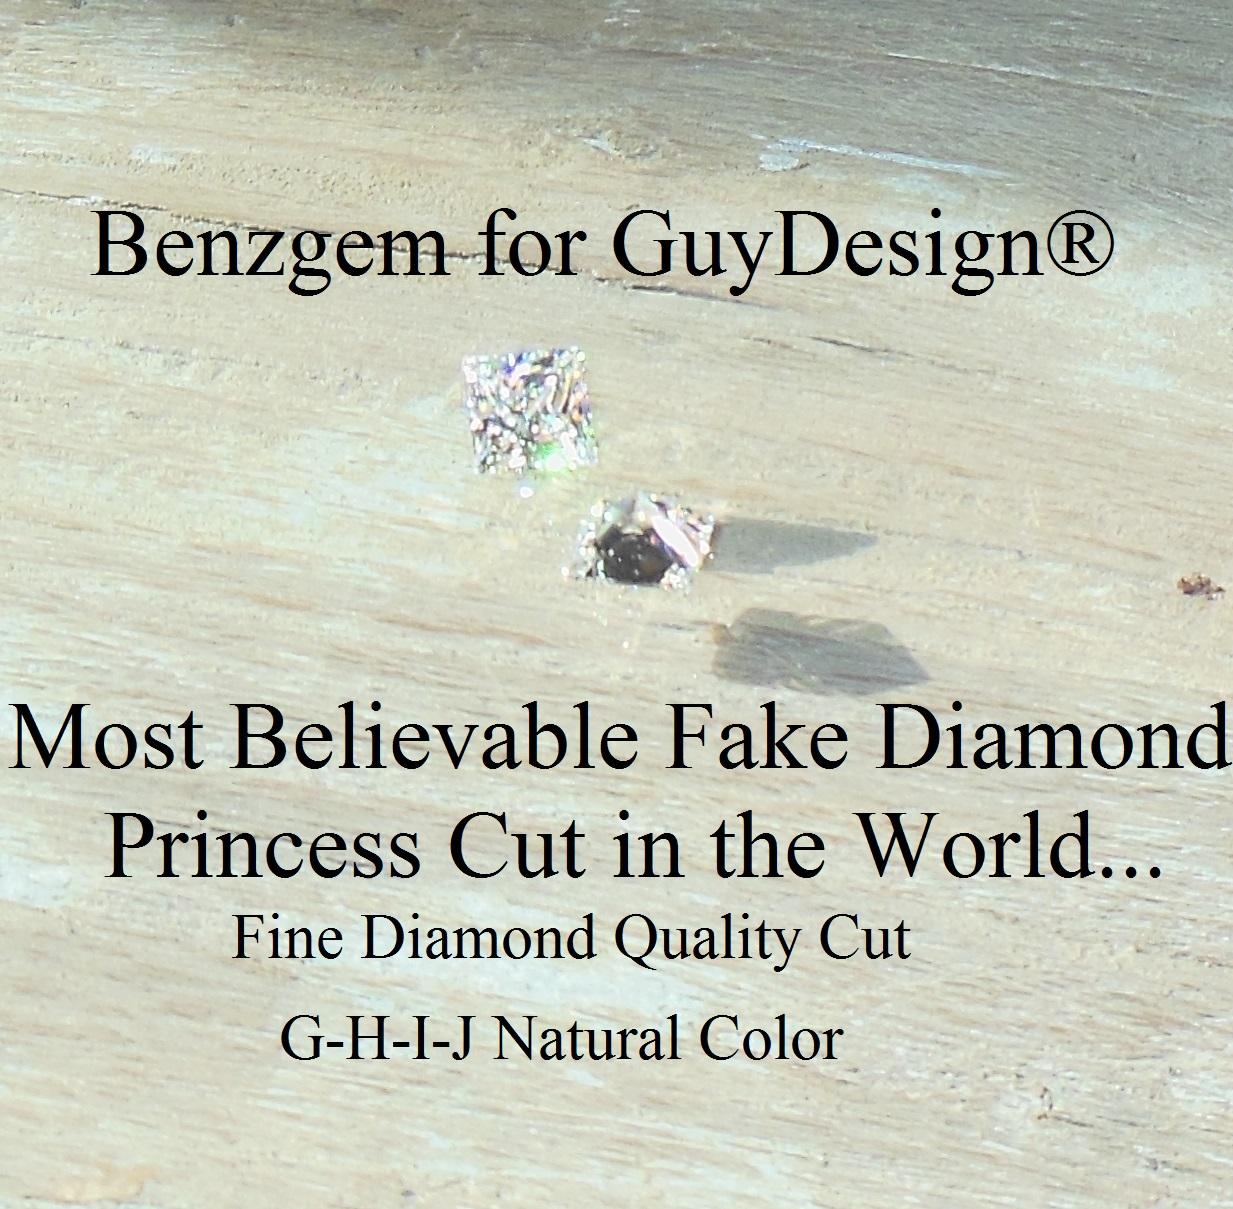 most-believable-fake-diamond-princess-cut-in-the-world-benzgem-for-guydesign-.jpg